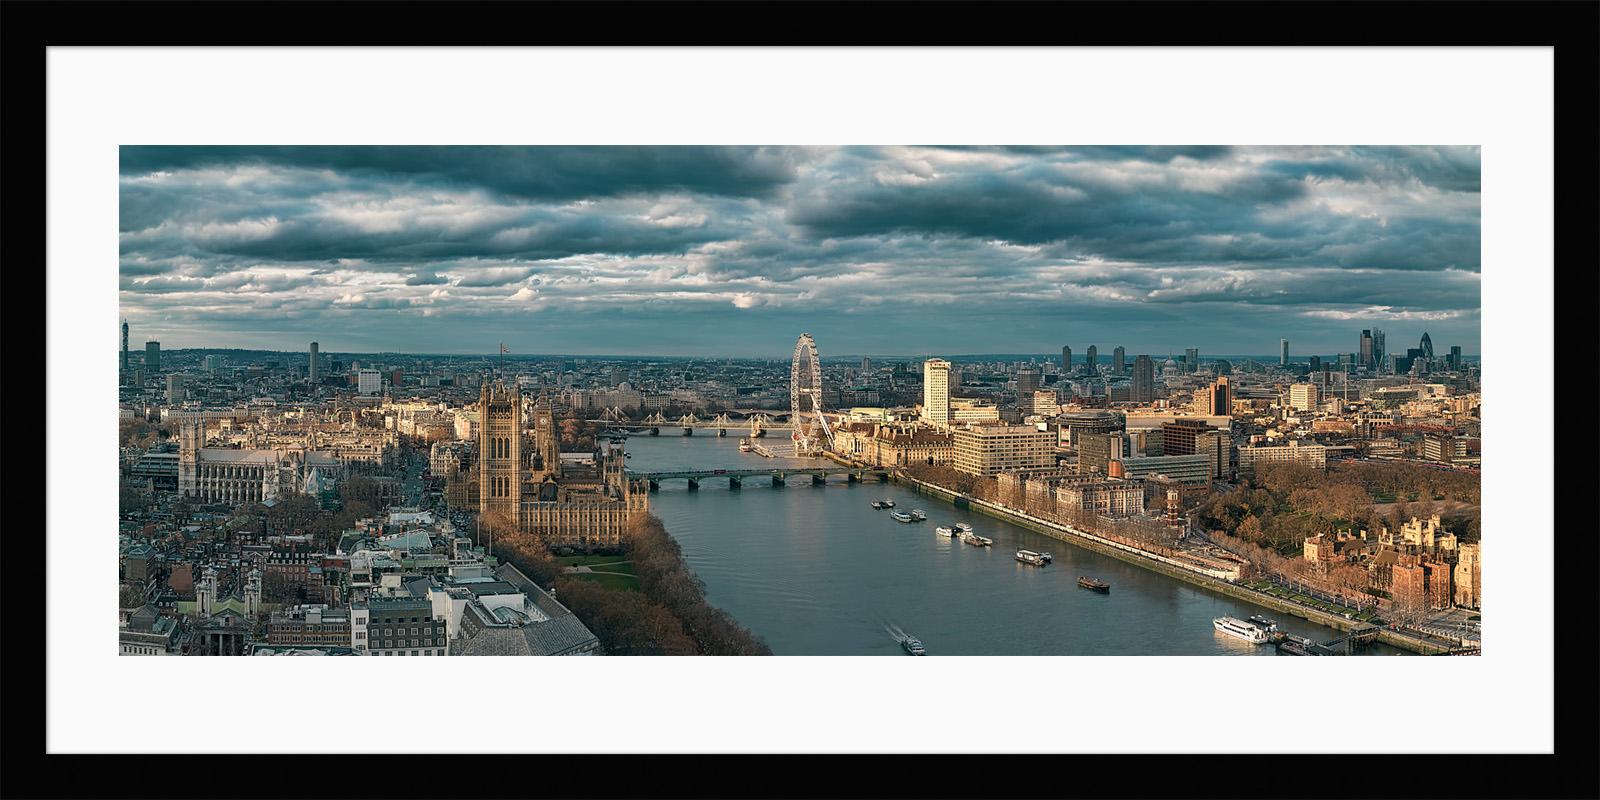 Sunlit London - The Thames, Houses of Parliament, London Eye. Framed London Fine Art Photo Print